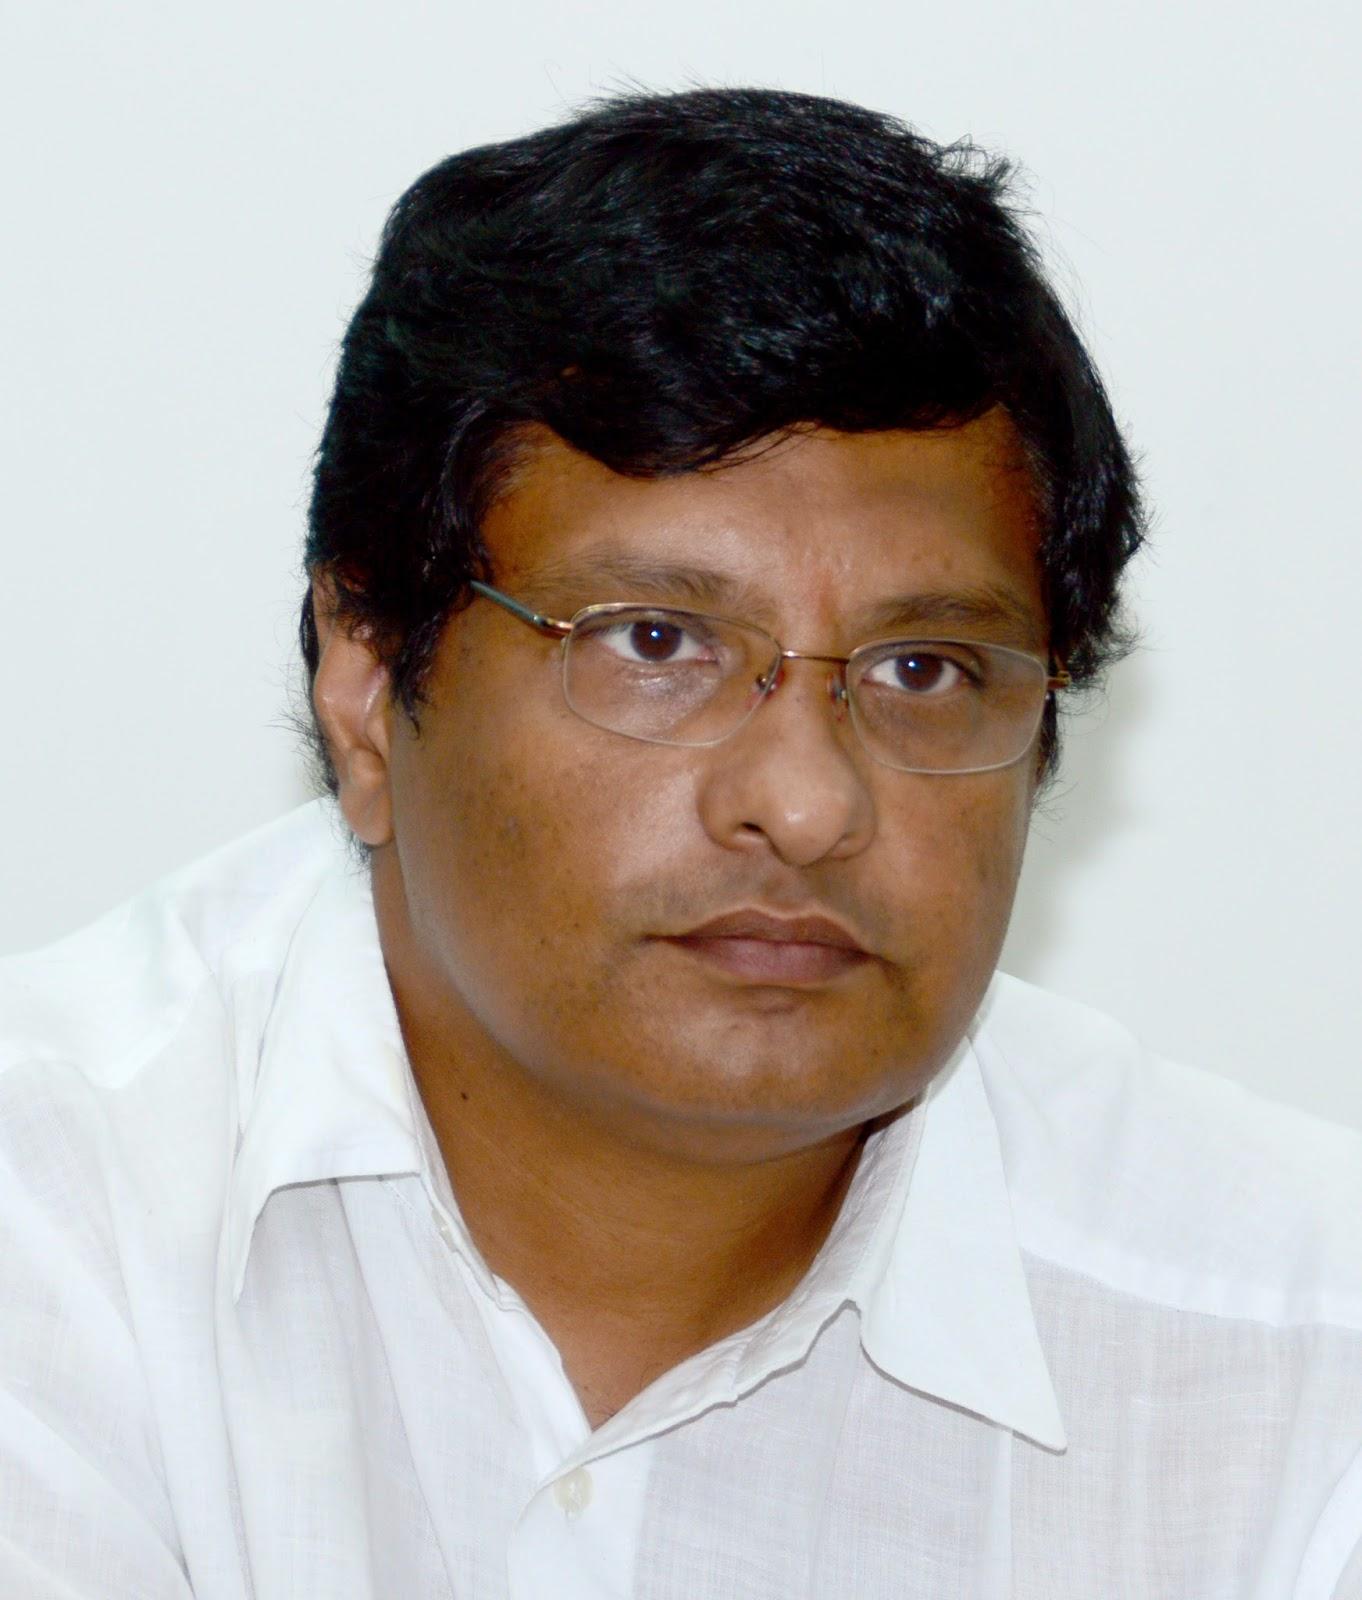 Kothagudem MLA Sri Jalagam <b>Venkat Rao</b> - DSC_0033-Kothagudem%2BMLA%2BSri%2BJalagam%2BVenkat%2BRao